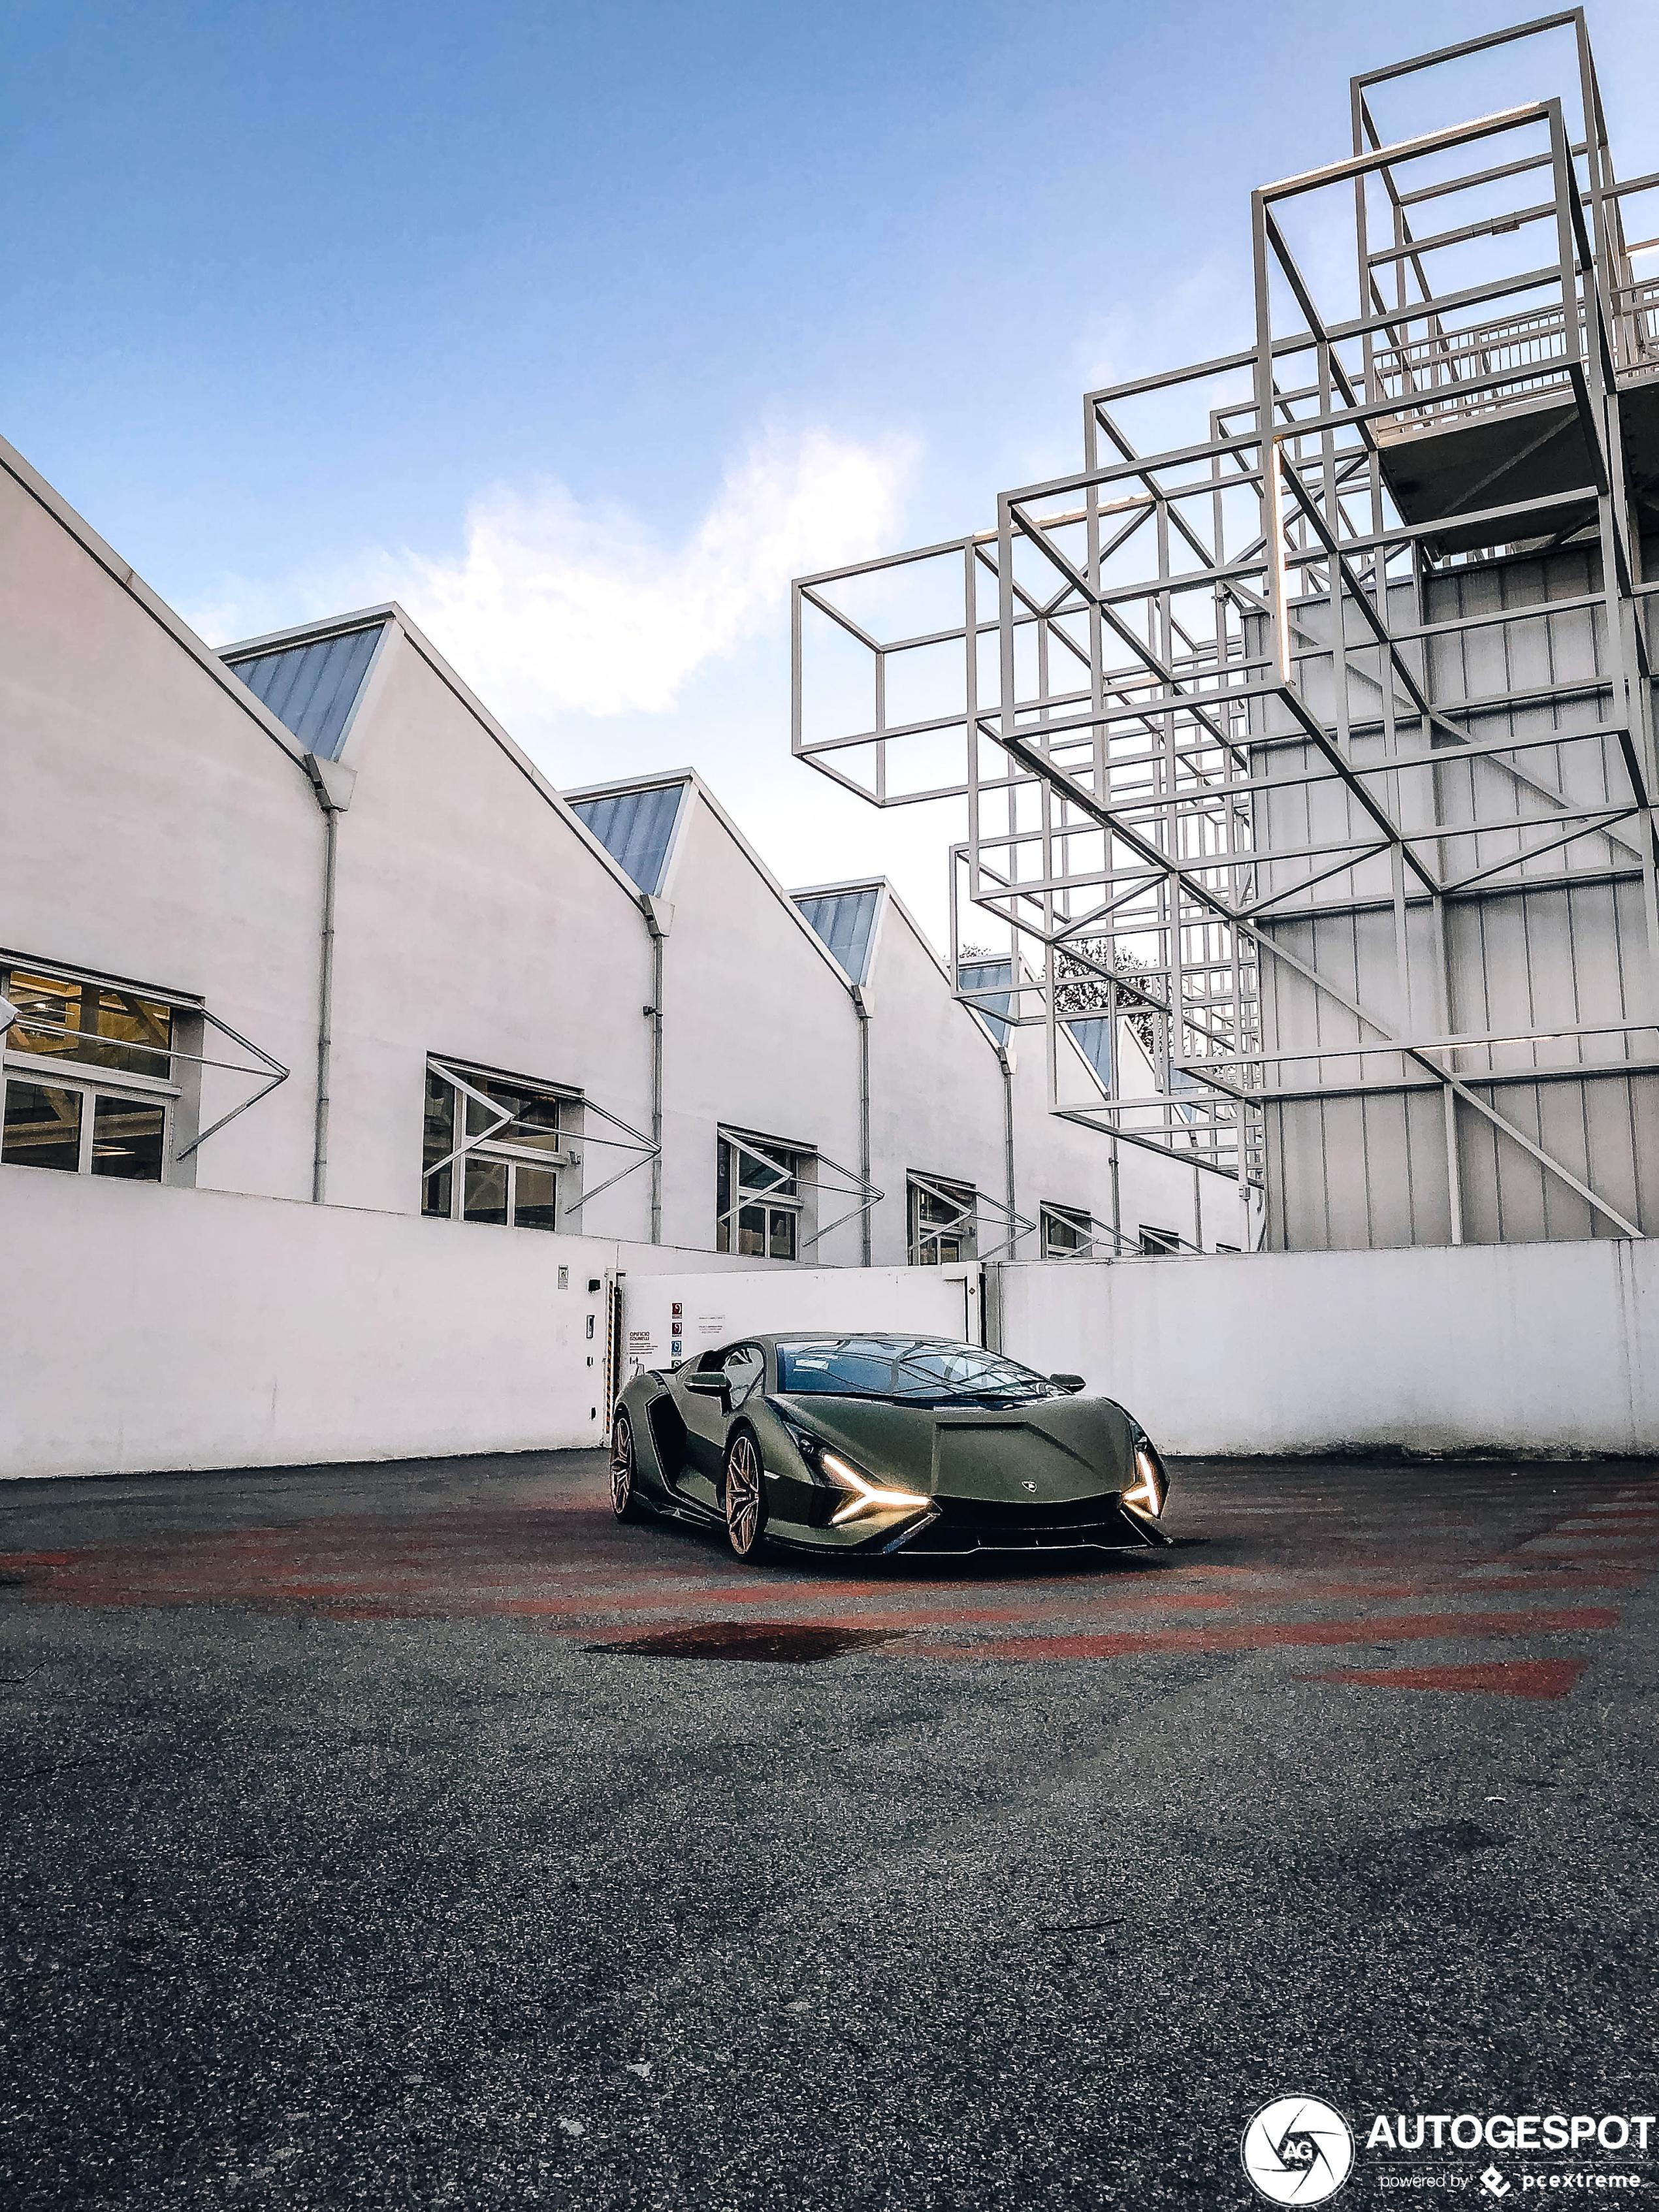 Lamborghini Sián FKP 37 shows up in Bologna!